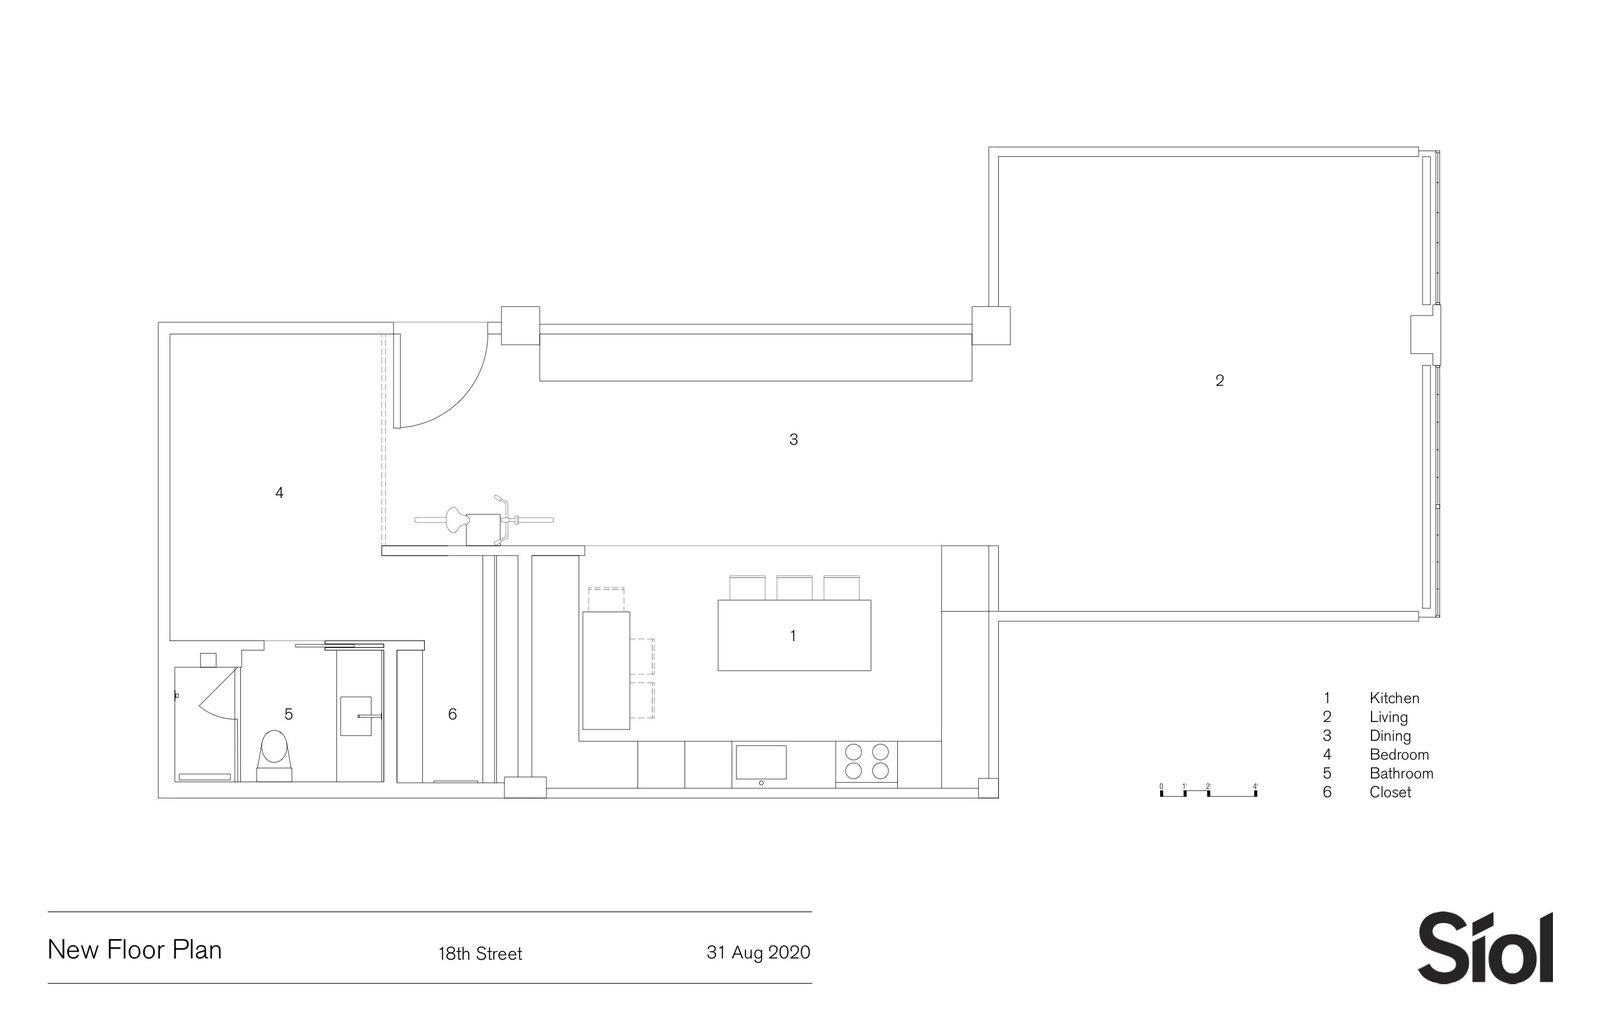 18th Street Loft new floor plan